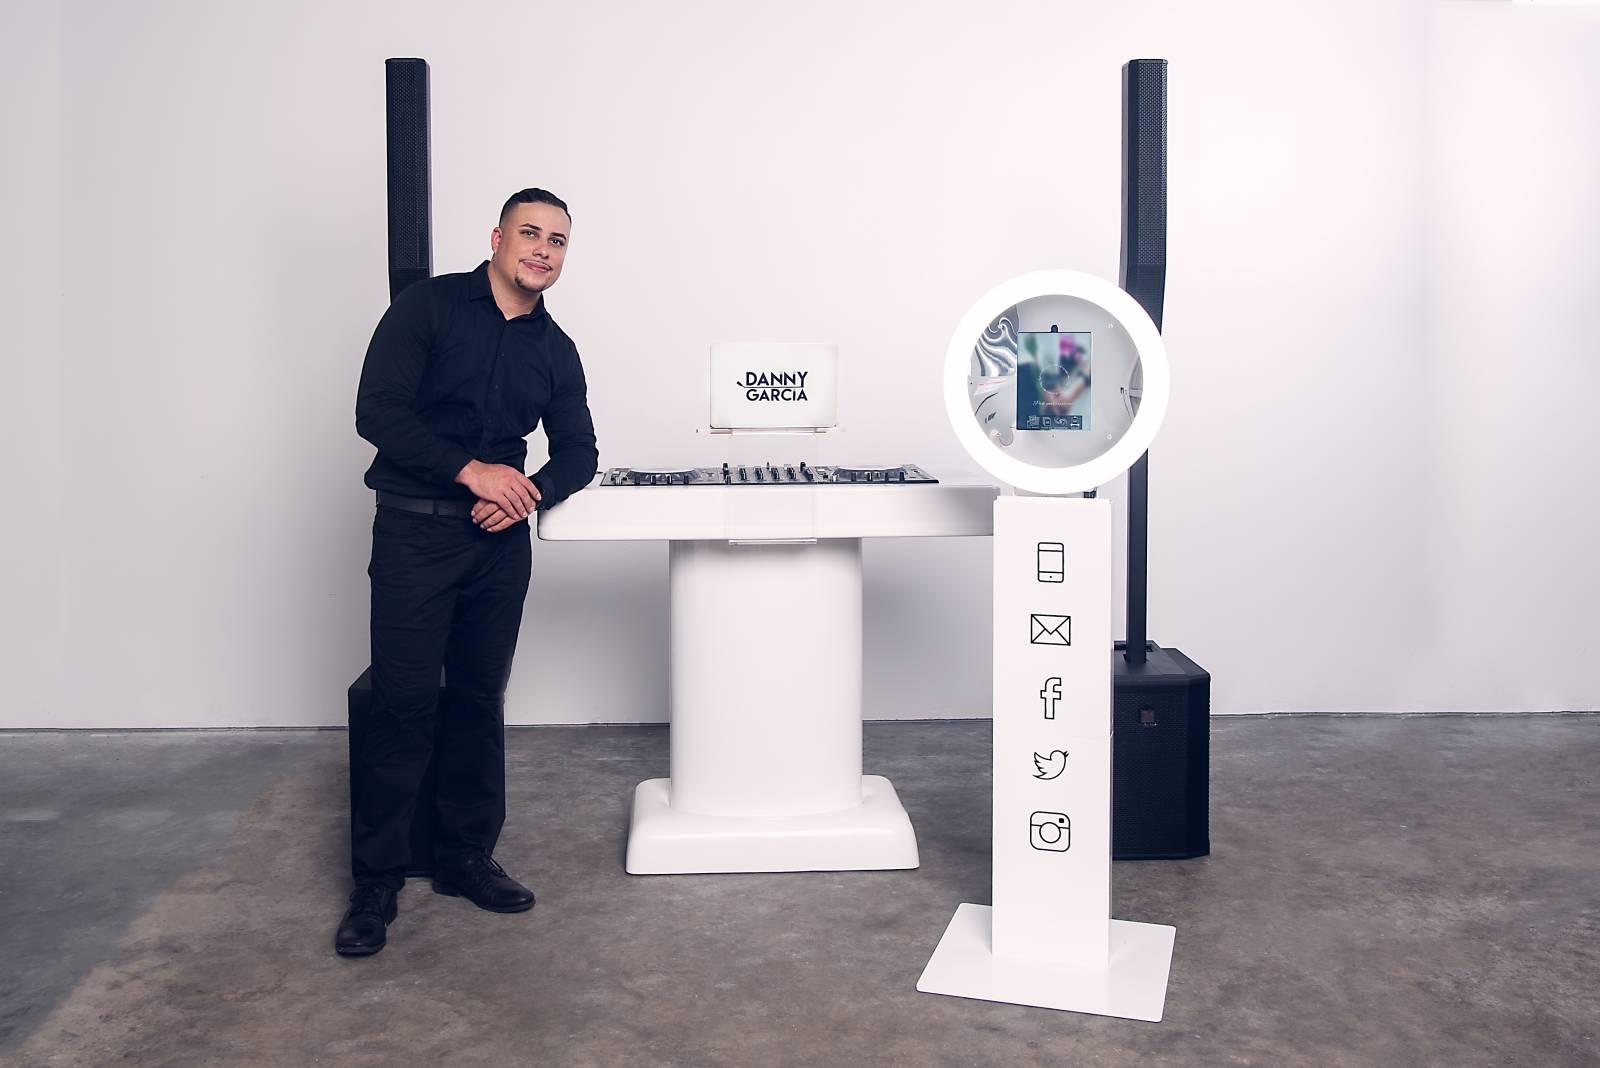 DJ Danny Garcia and his sound system